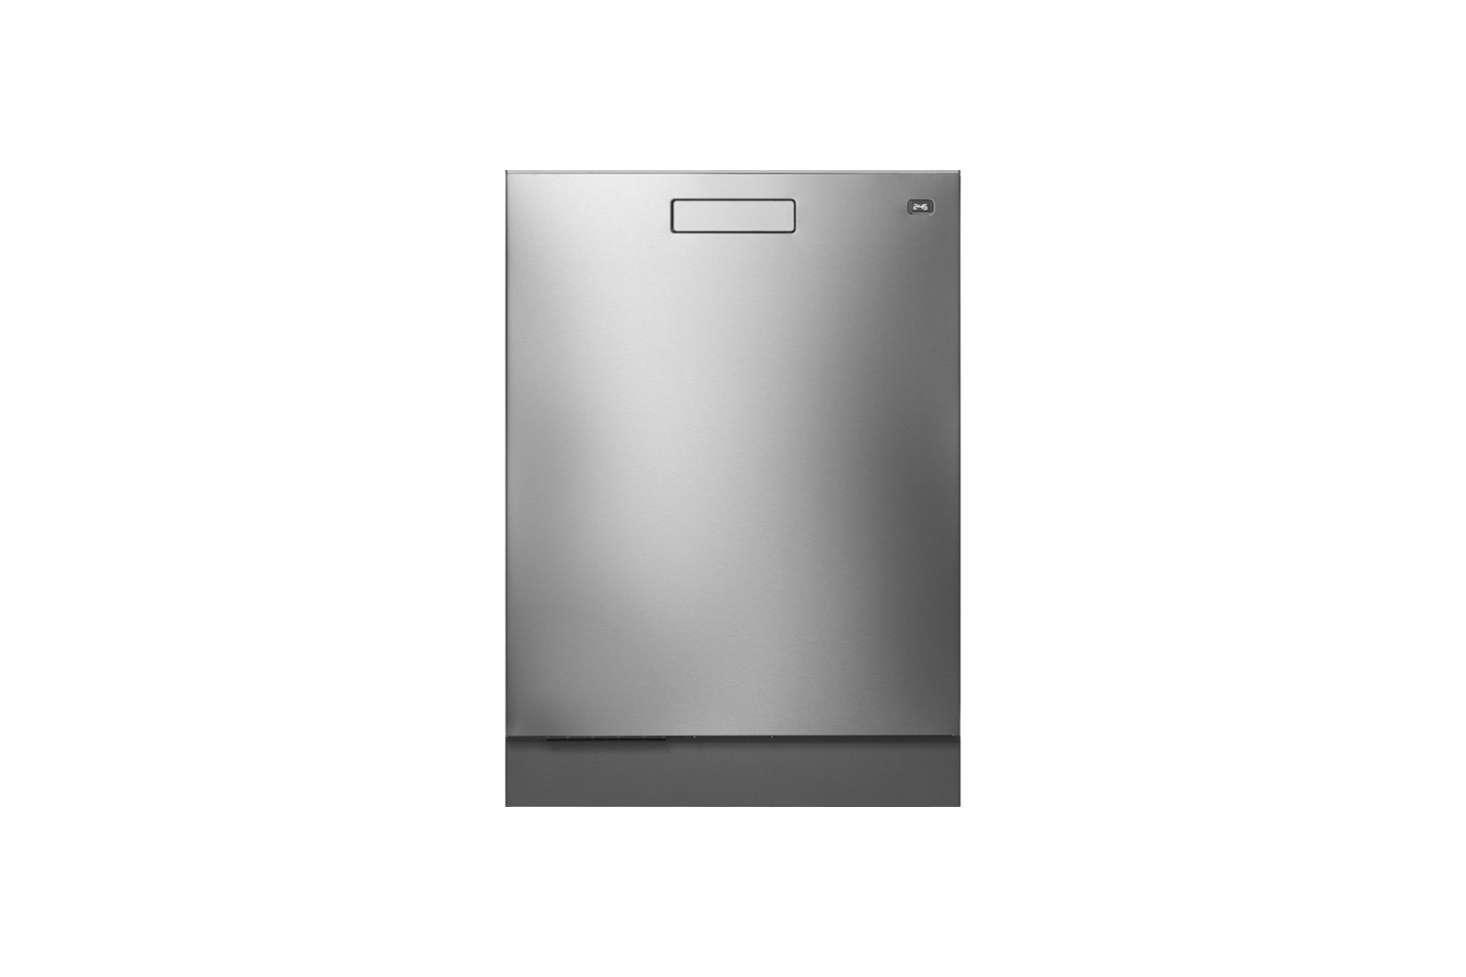 The dishwasher is the Scandinavian Asko Built-In Dishwasher (D5636XXLSHI); $src=